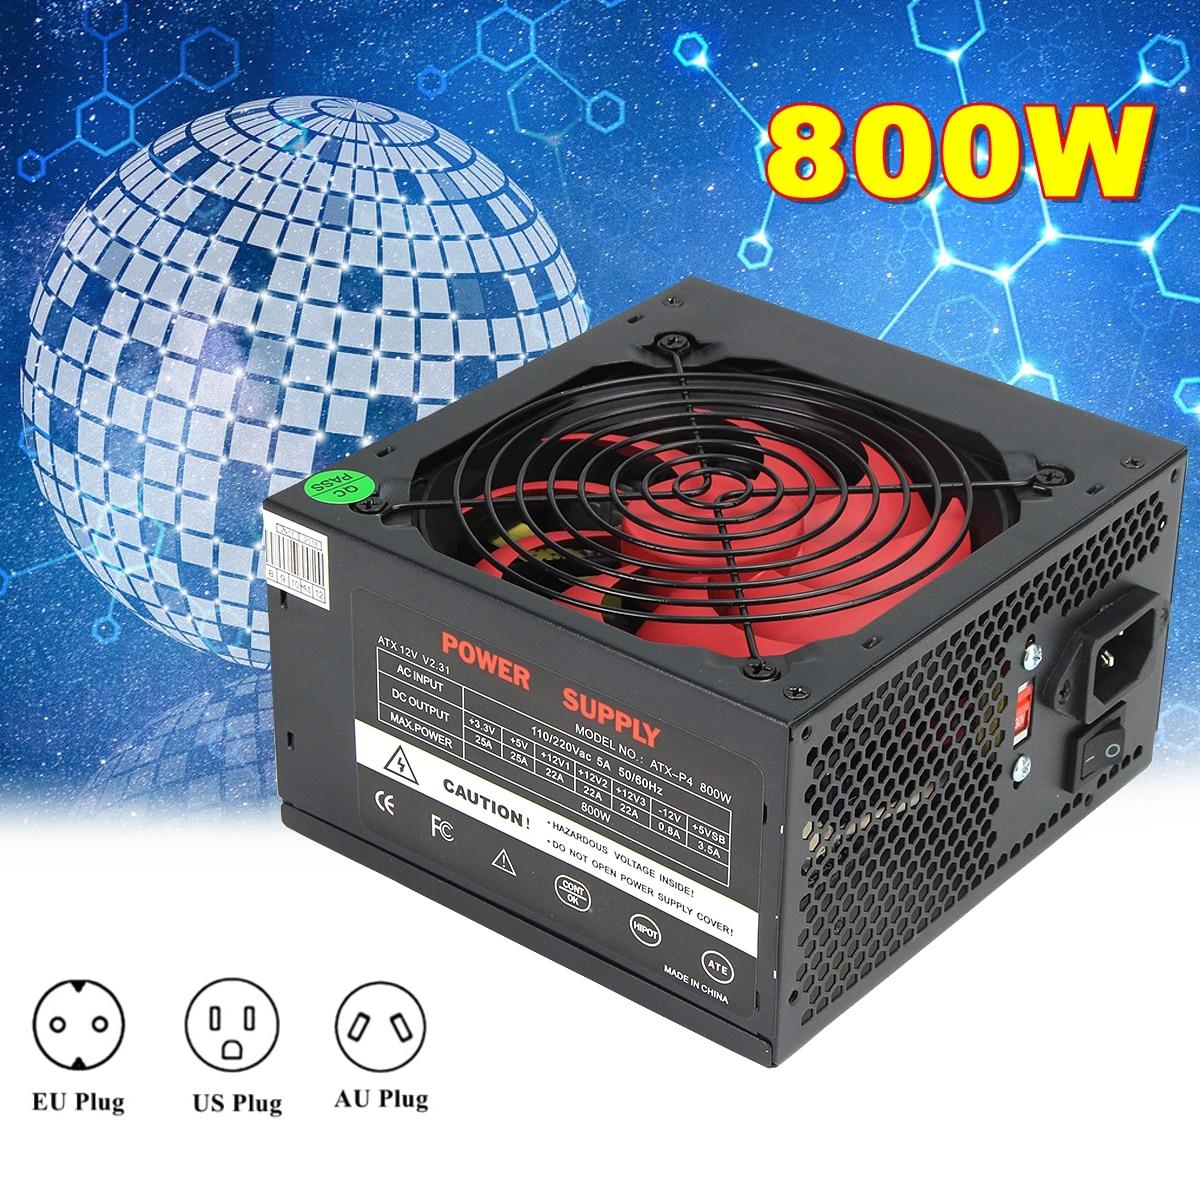 Black 800W 800 Watt Power Supply 120mm Fan 24 Pin PCI SATA ATX 12V Molex Connect Computer Power Supply 80+Gold rp7410 rp8400 a6093 69023 aa21590 pci power supply